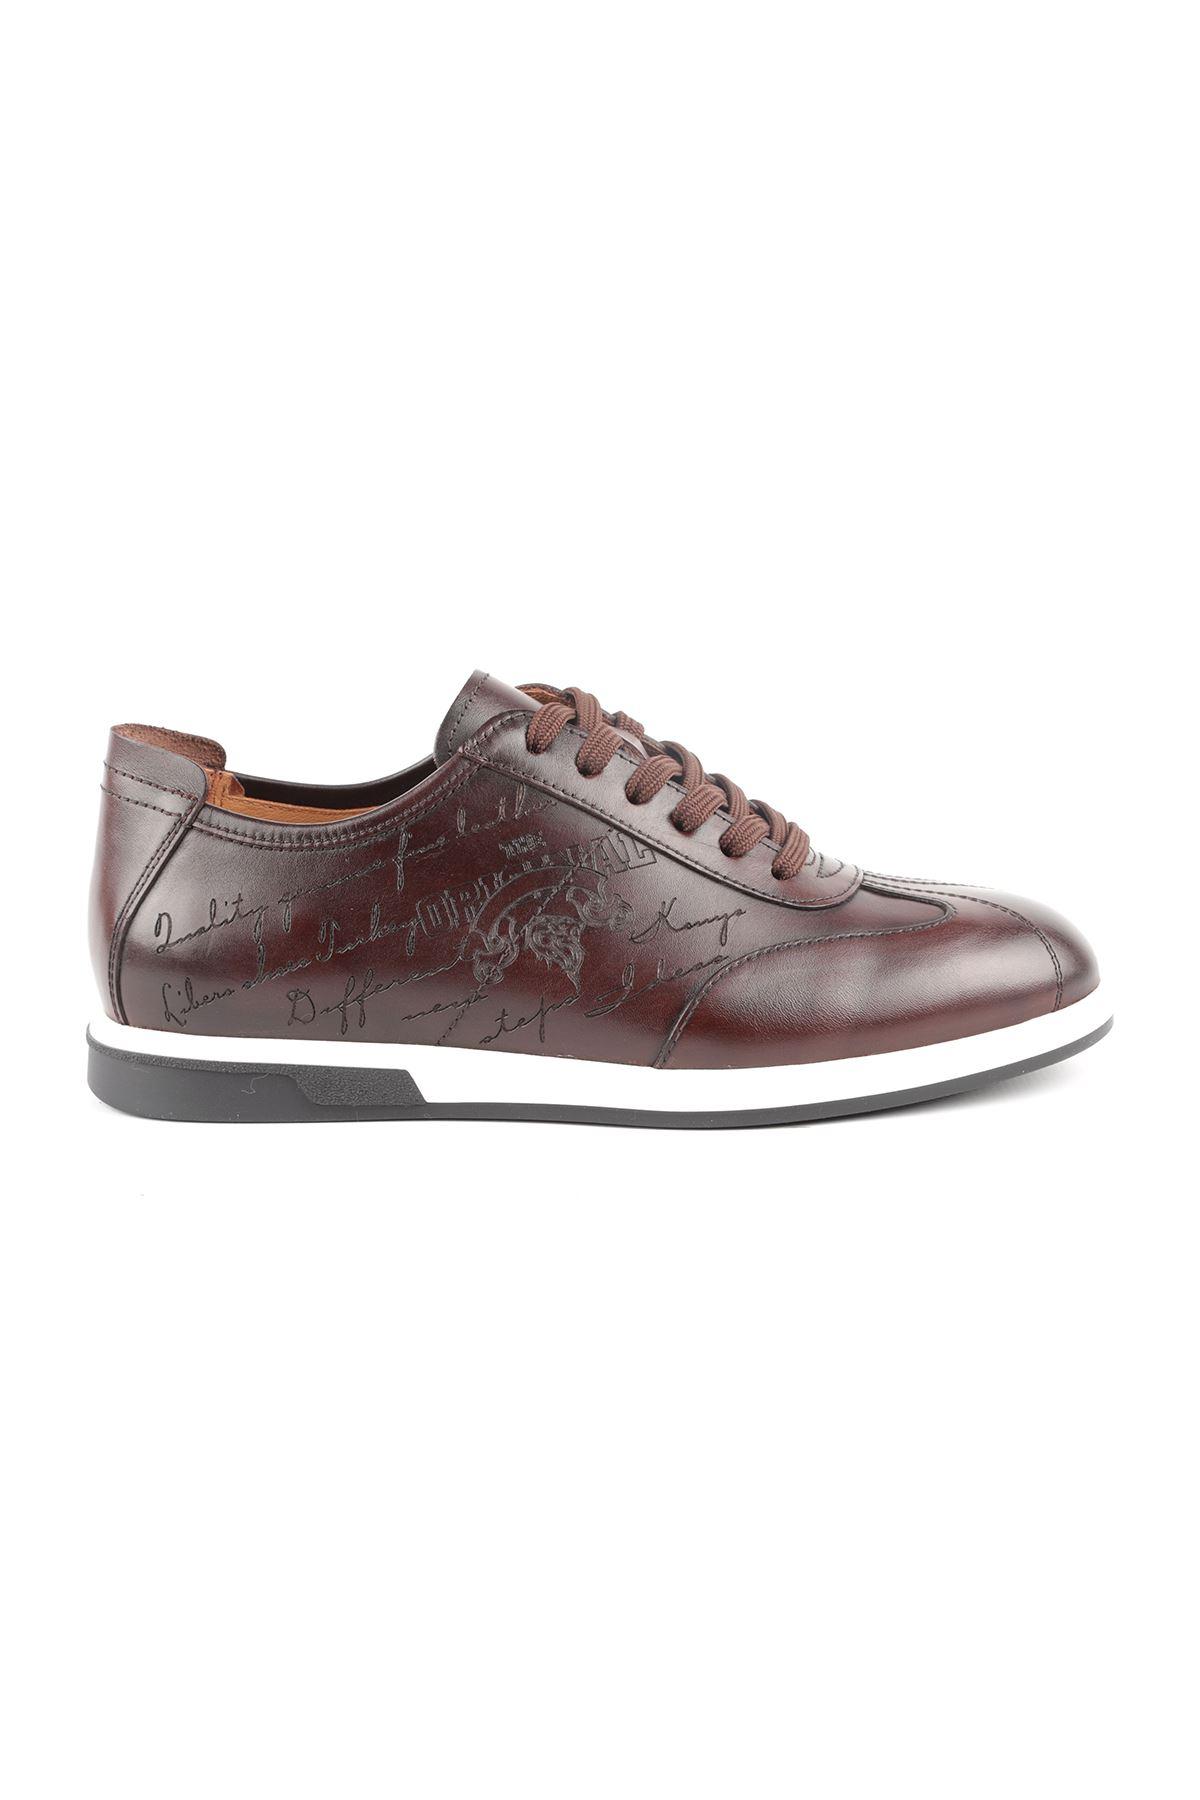 Libero L3772 Brown Men's Sport Shoes